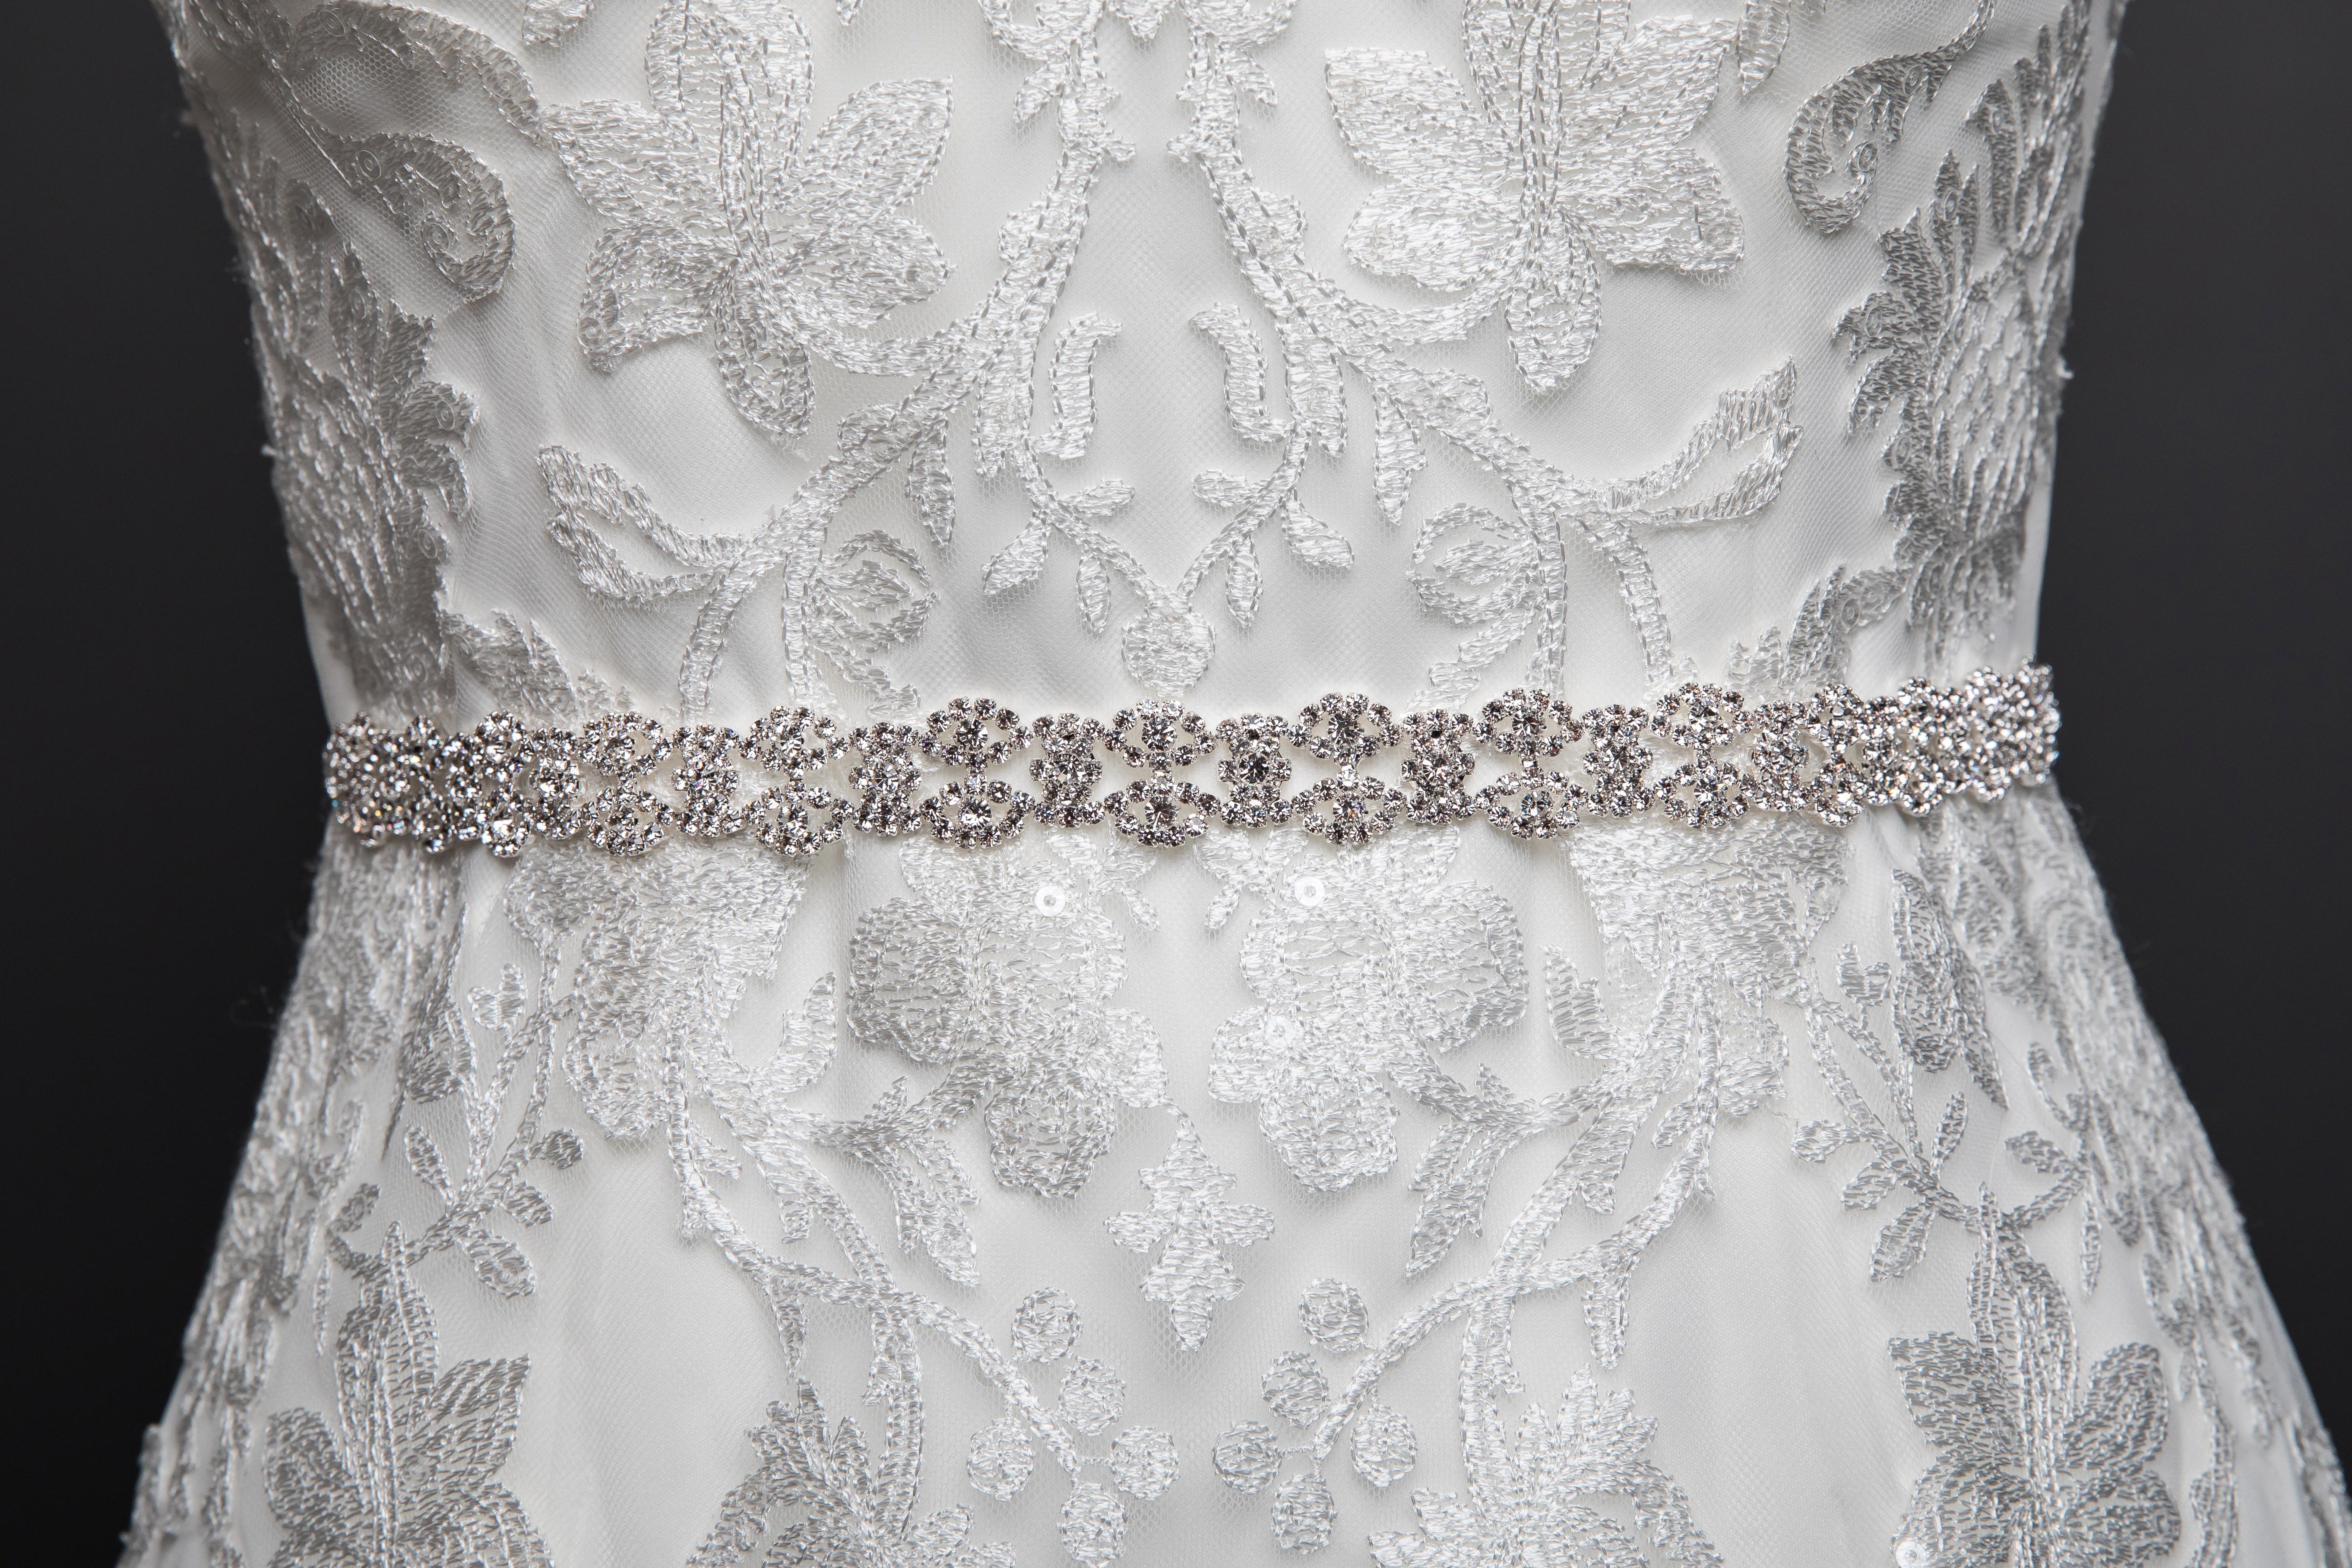 Bridal Classics Belts & Gown Jewellery BELT-64